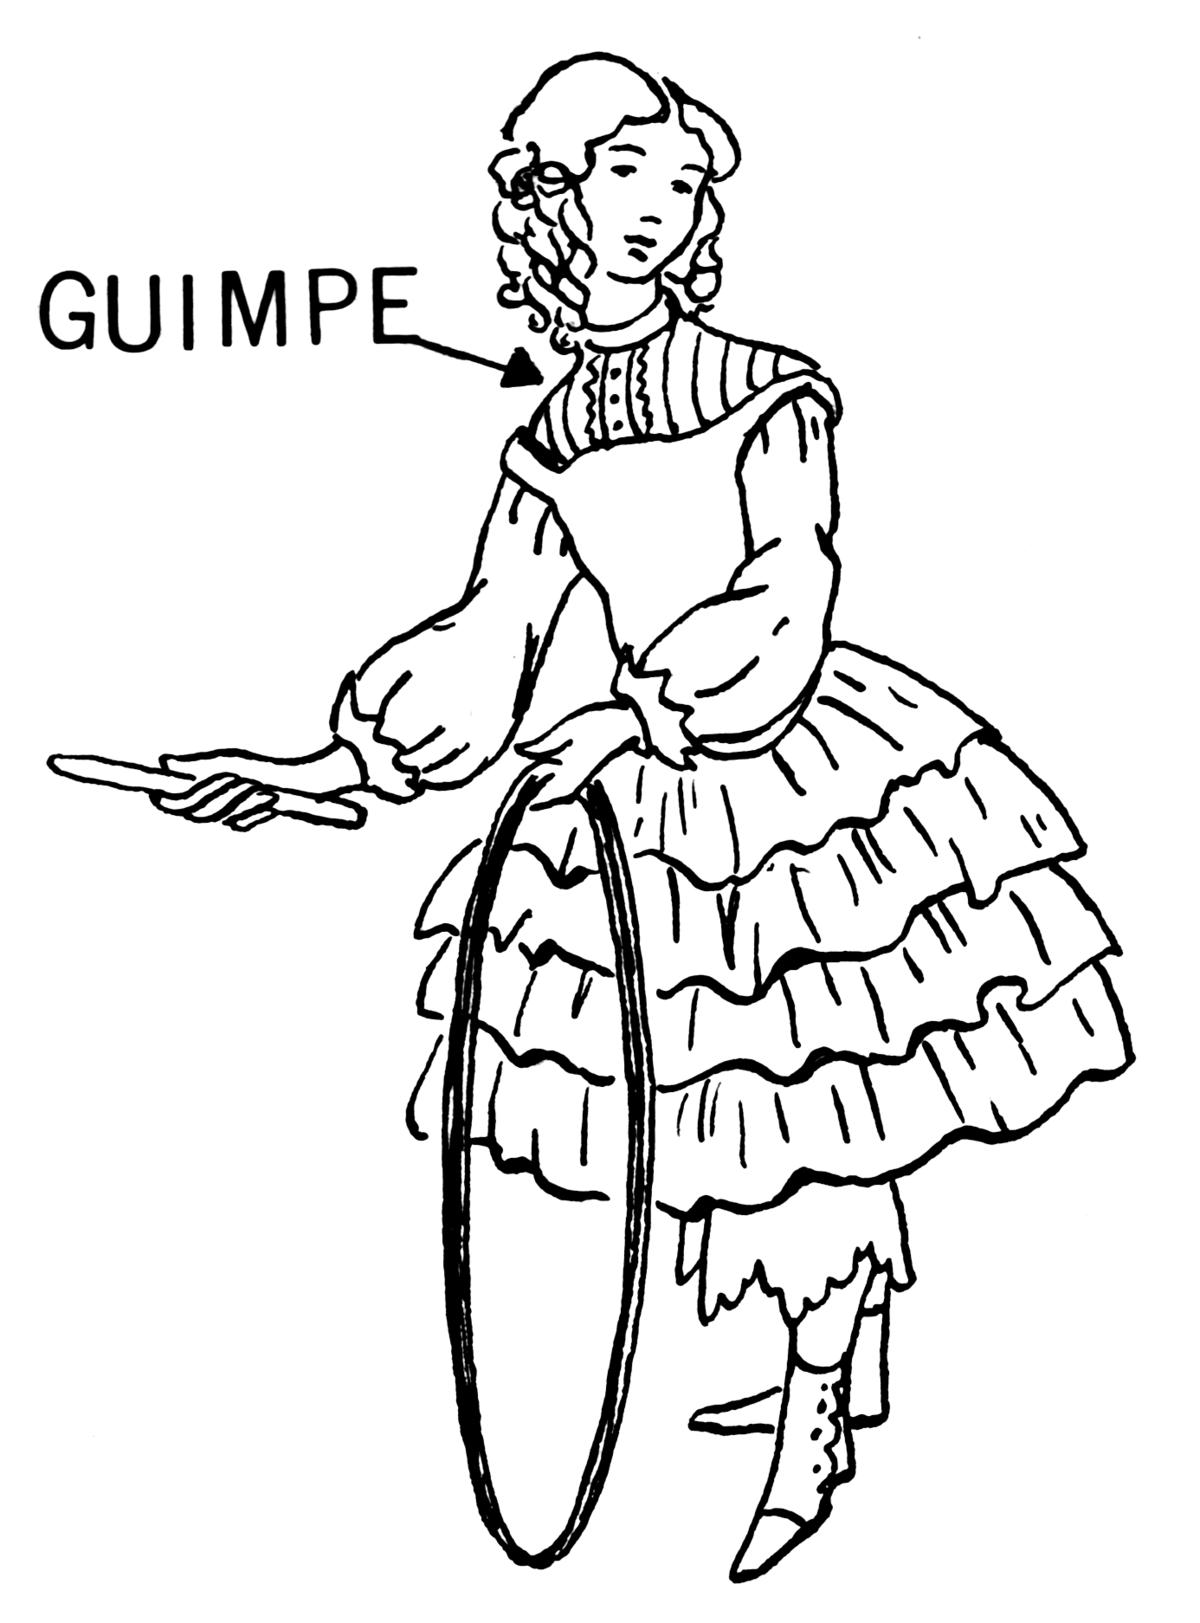 Guimpe wiktionnaire for Portent wiktionary